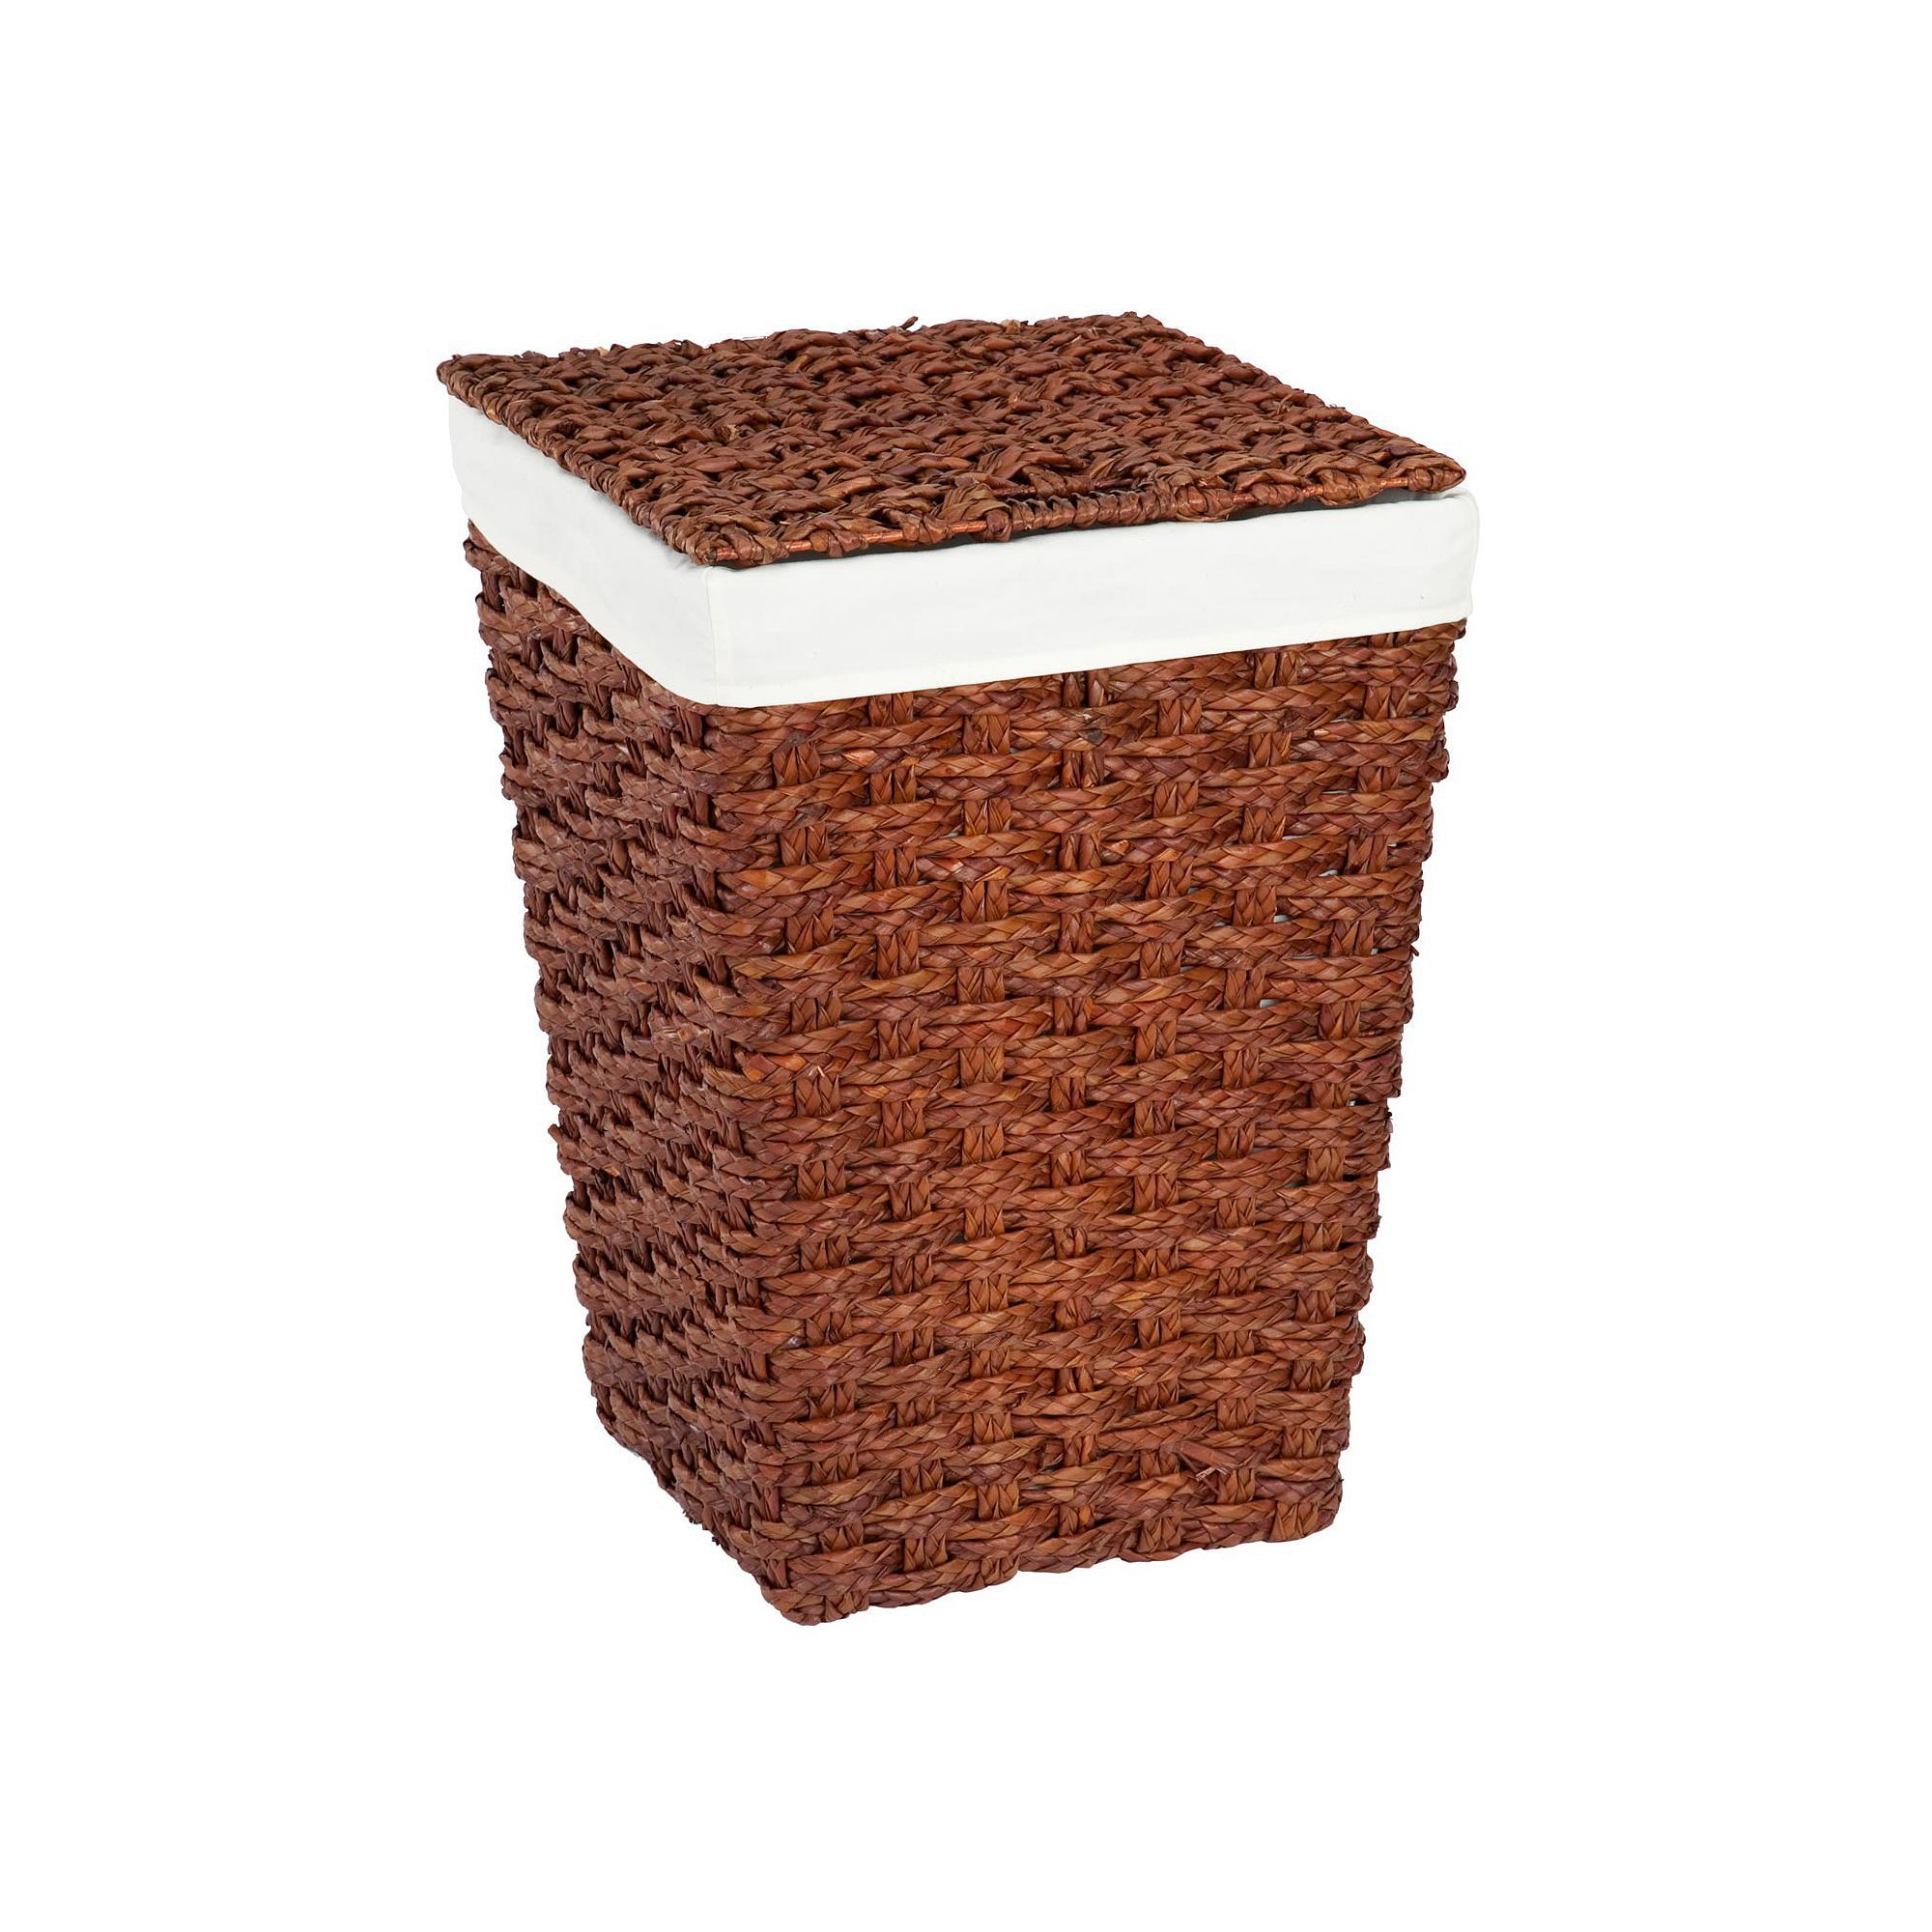 Creative Ware Home Chunky Weave 2 Hamper Brown Laundry Hamper Hamper Basket